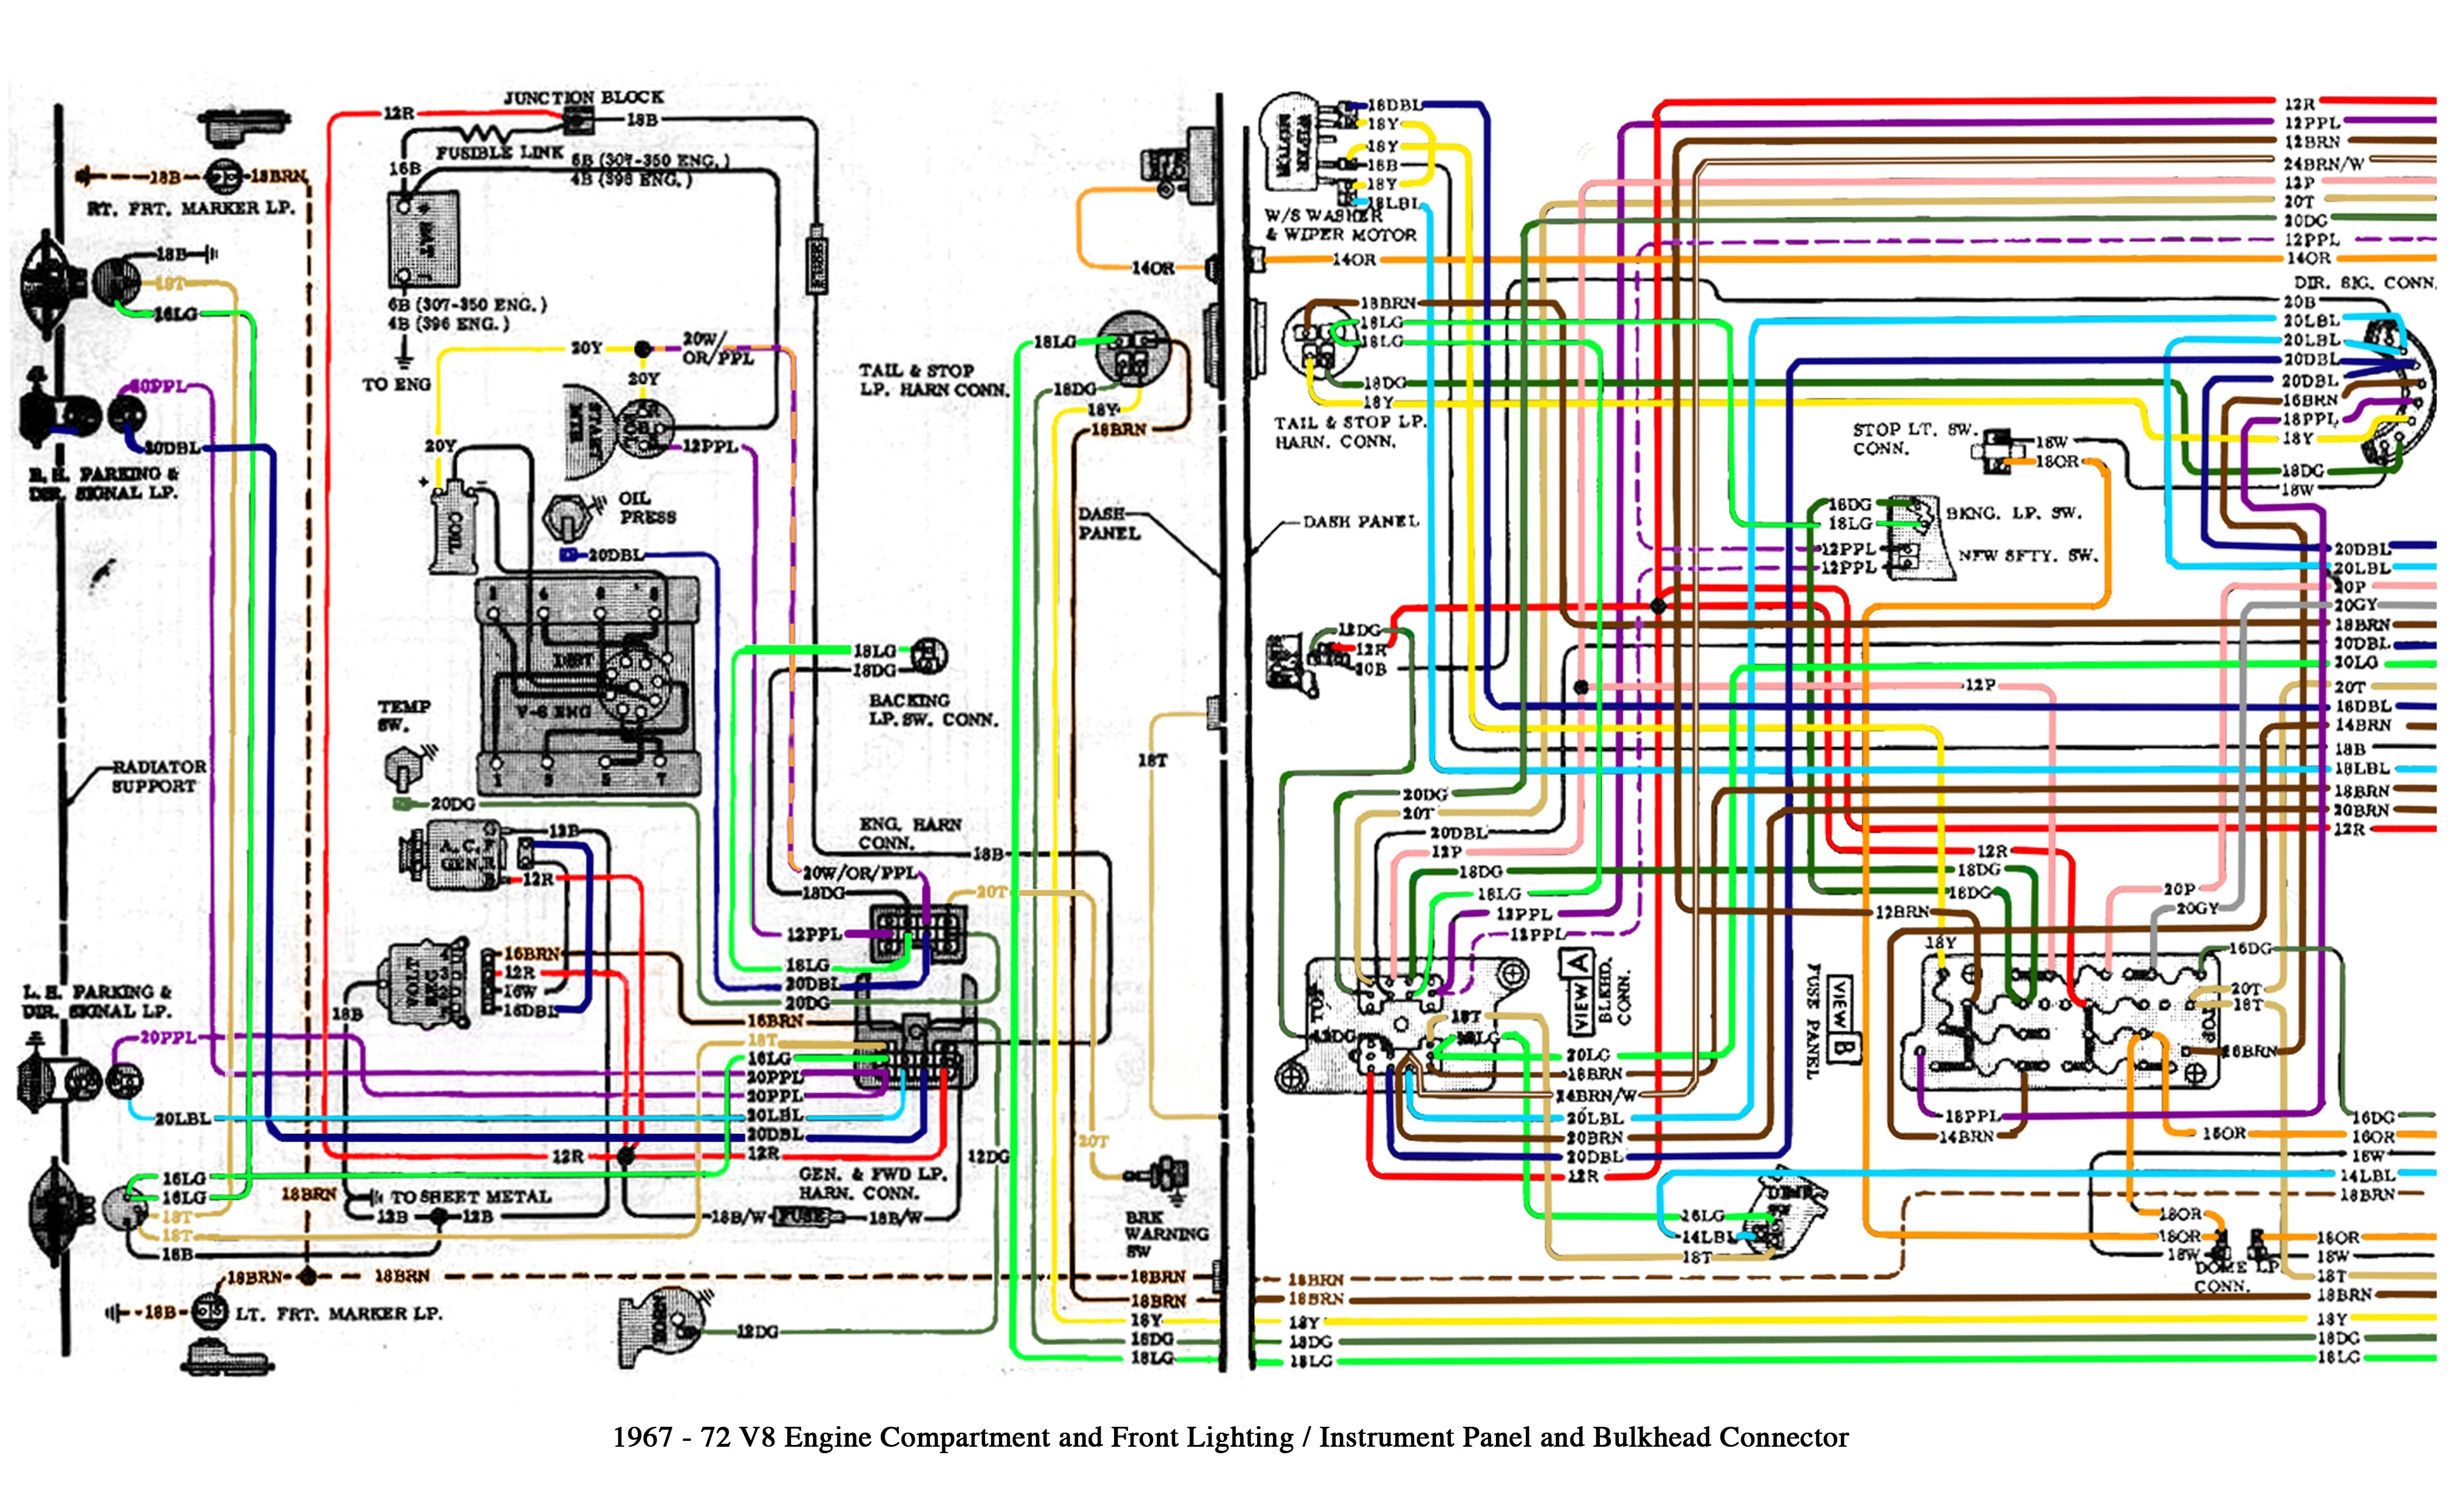 [EQHS_1162]  GM_6790] Radio Wiring Diagram For Chevy C10   Chevy S10 Wiring Diagram      Tobiq Gresi Lectr Emba Semec Habi Wigeg Mohammedshrine Librar Wiring 101